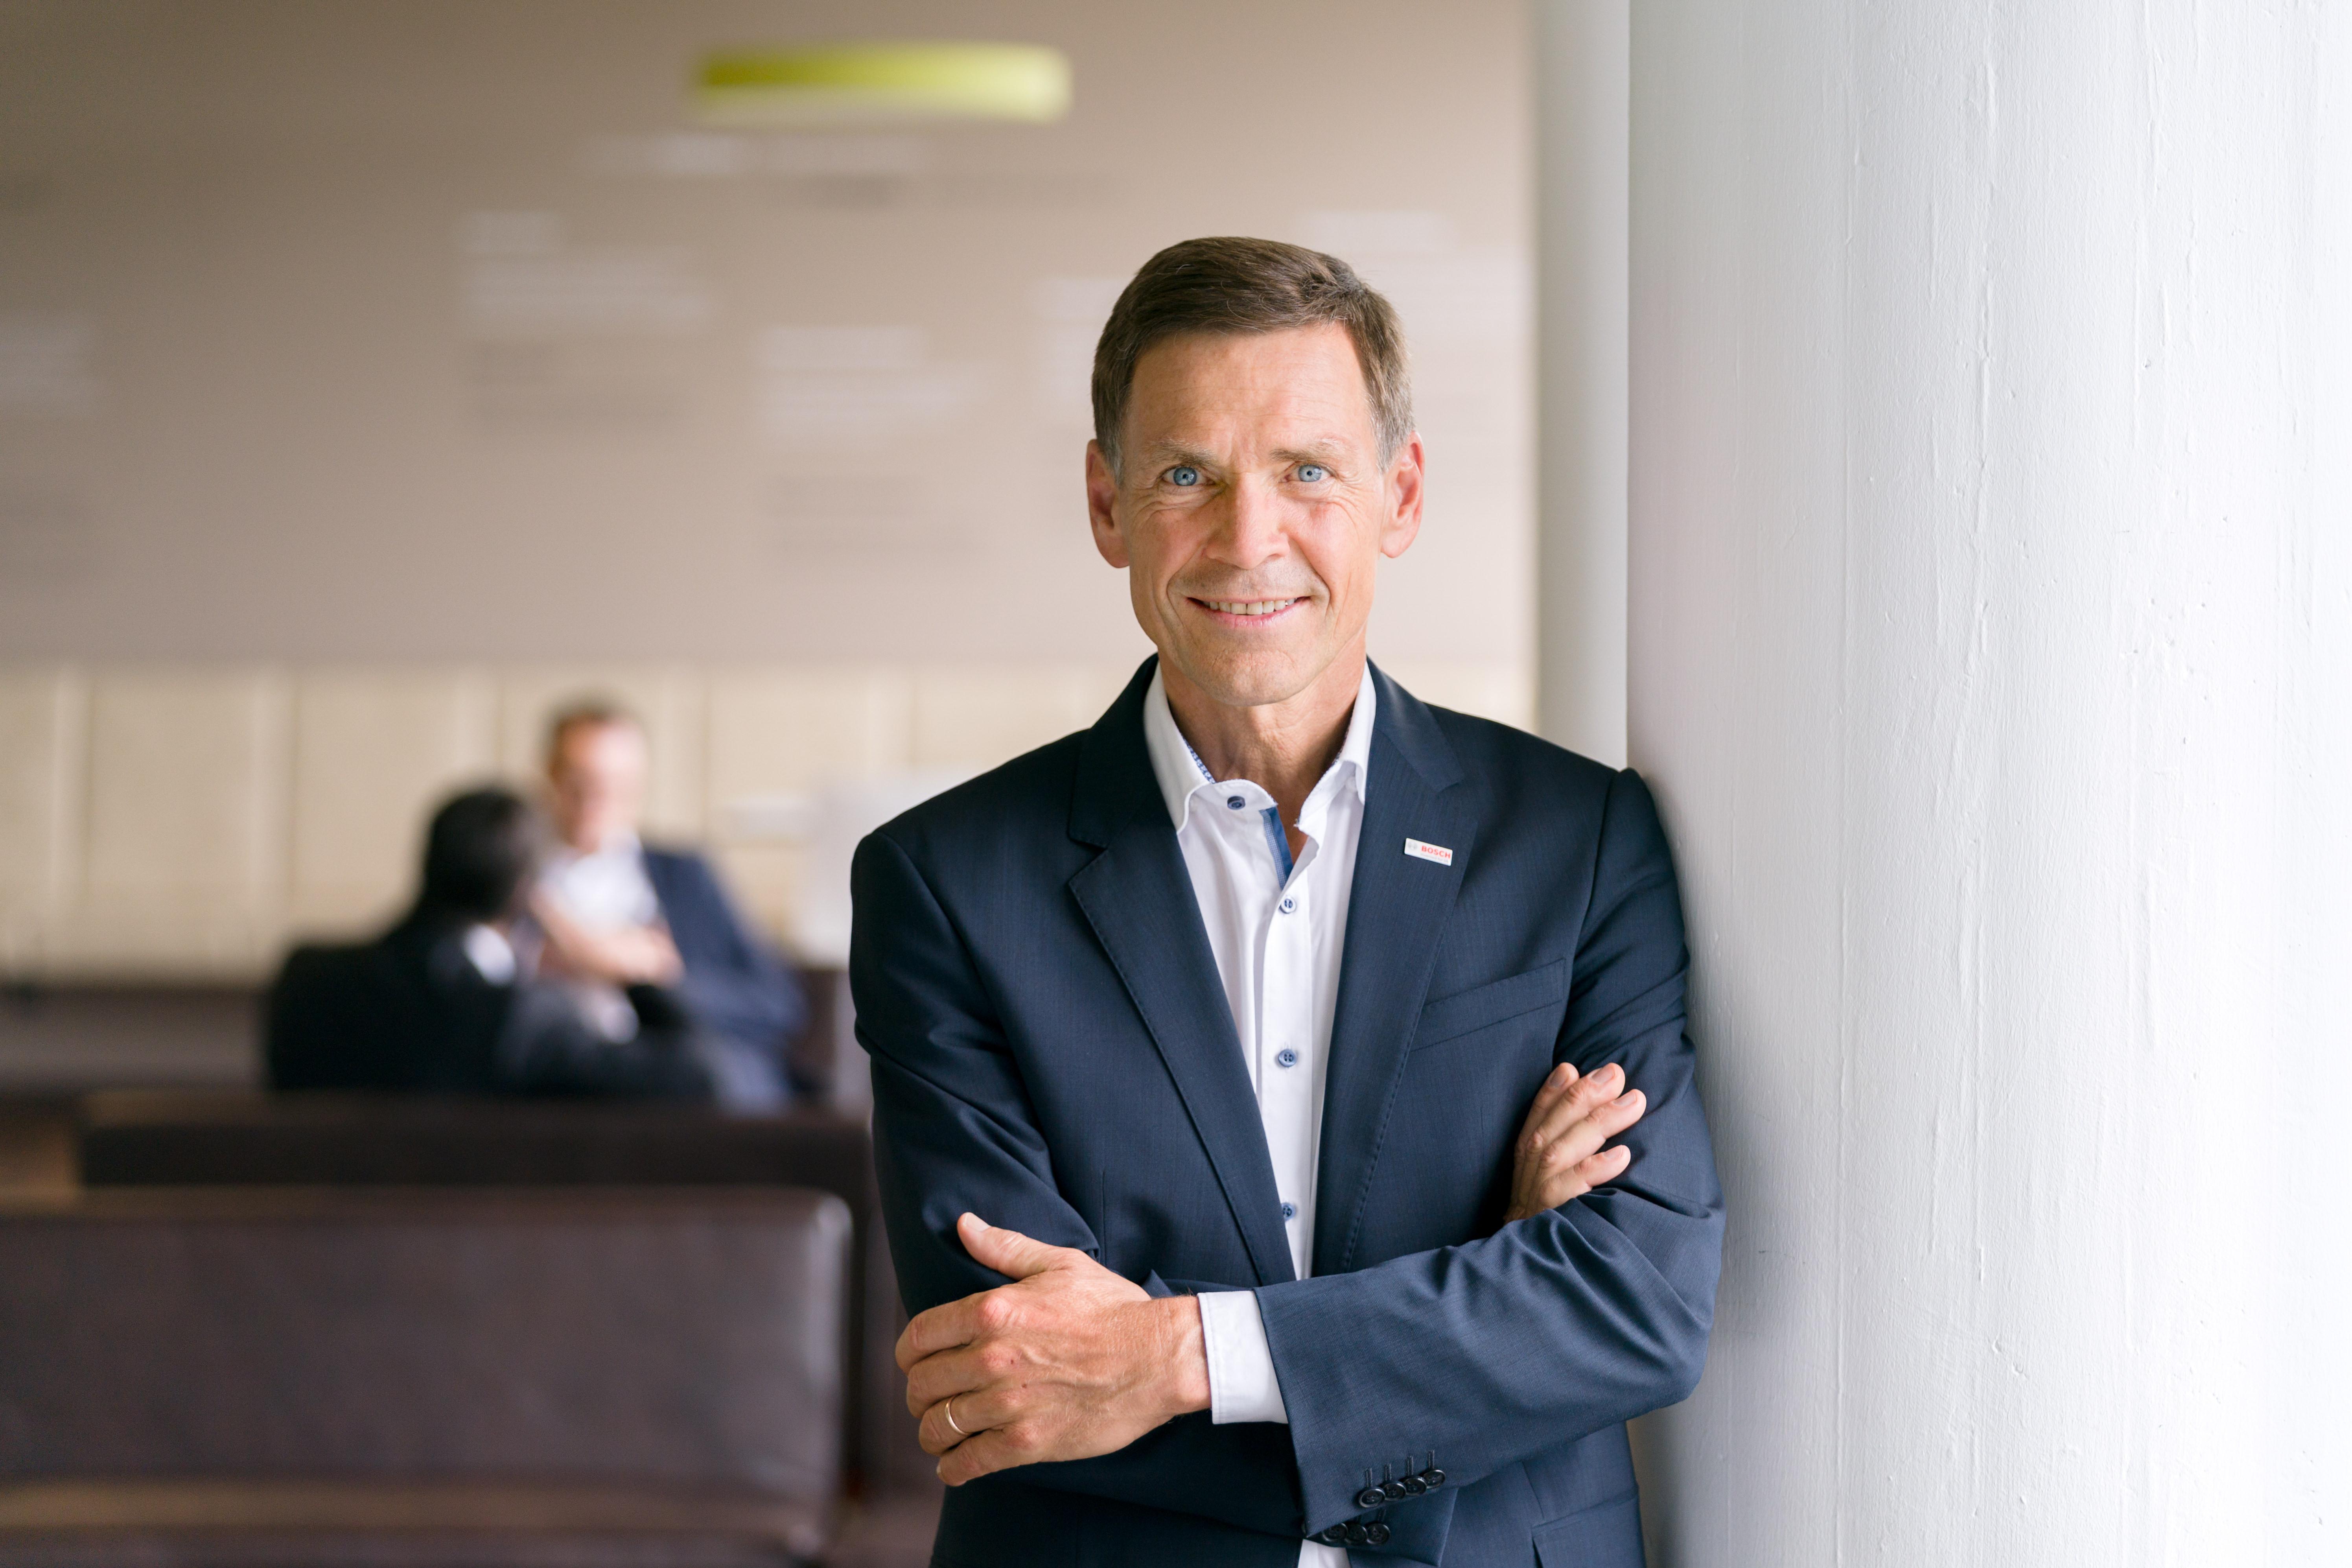 Christoph Kübel, member of the board of management and director of industrial relations at Robert Bosch GmbH;Christoph Kübel